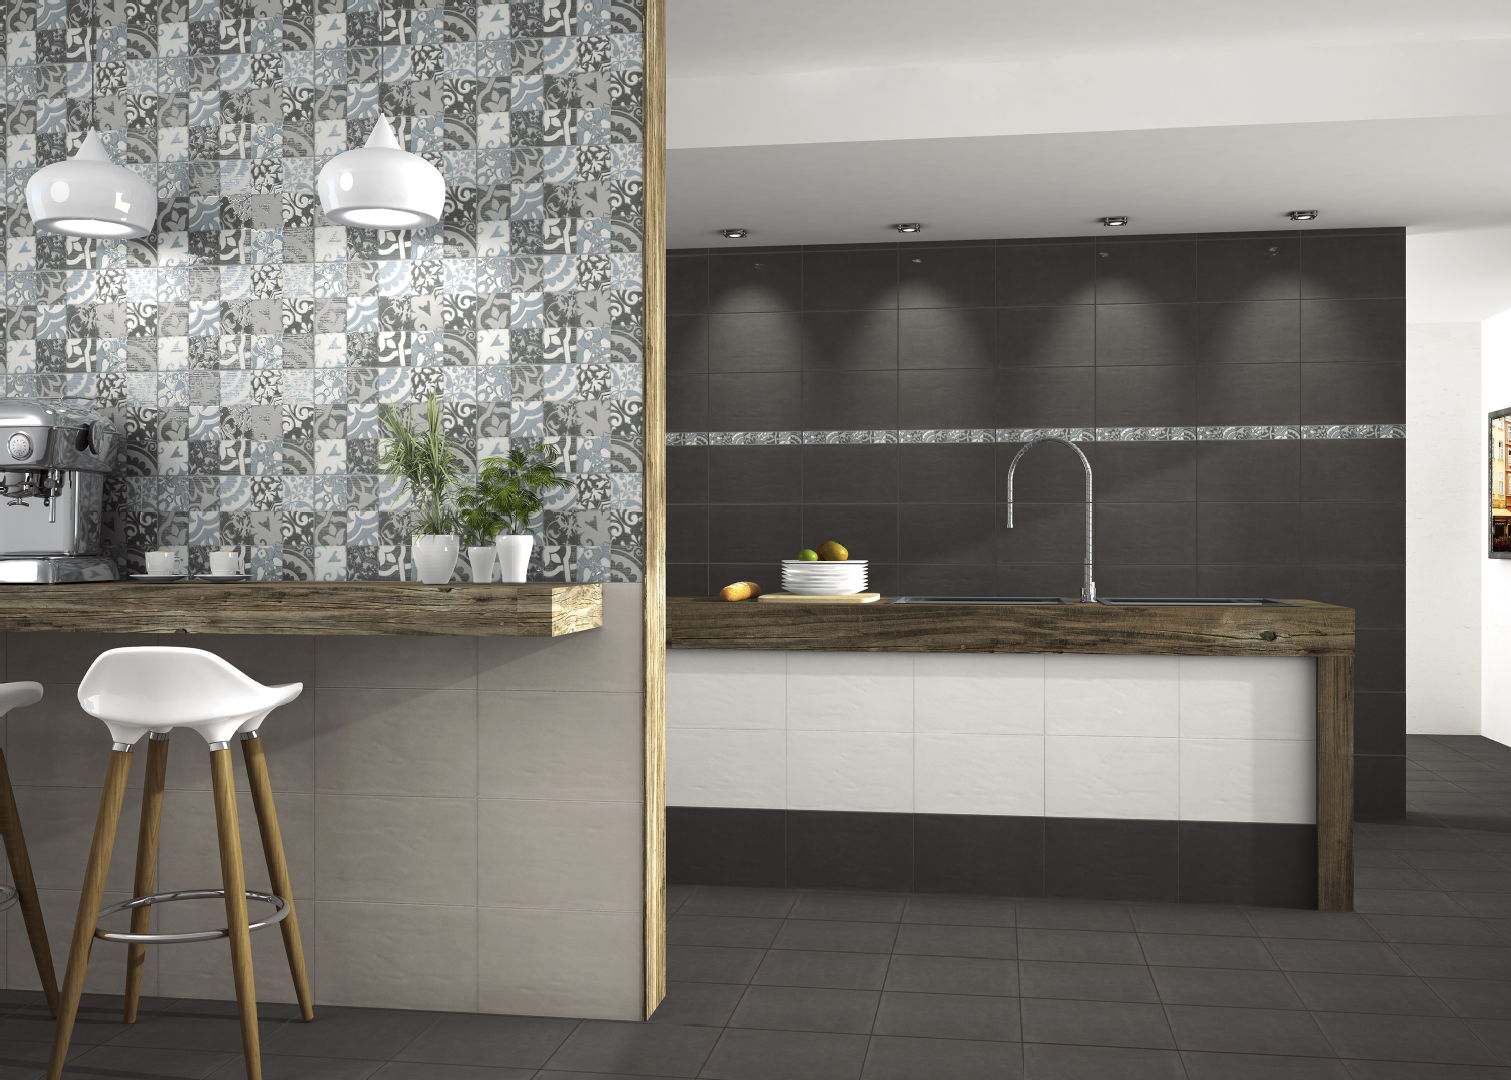 Moderni keittiö, Seinälaatta, K rauta, 5612af3be4b0288996185975  Etuovi com